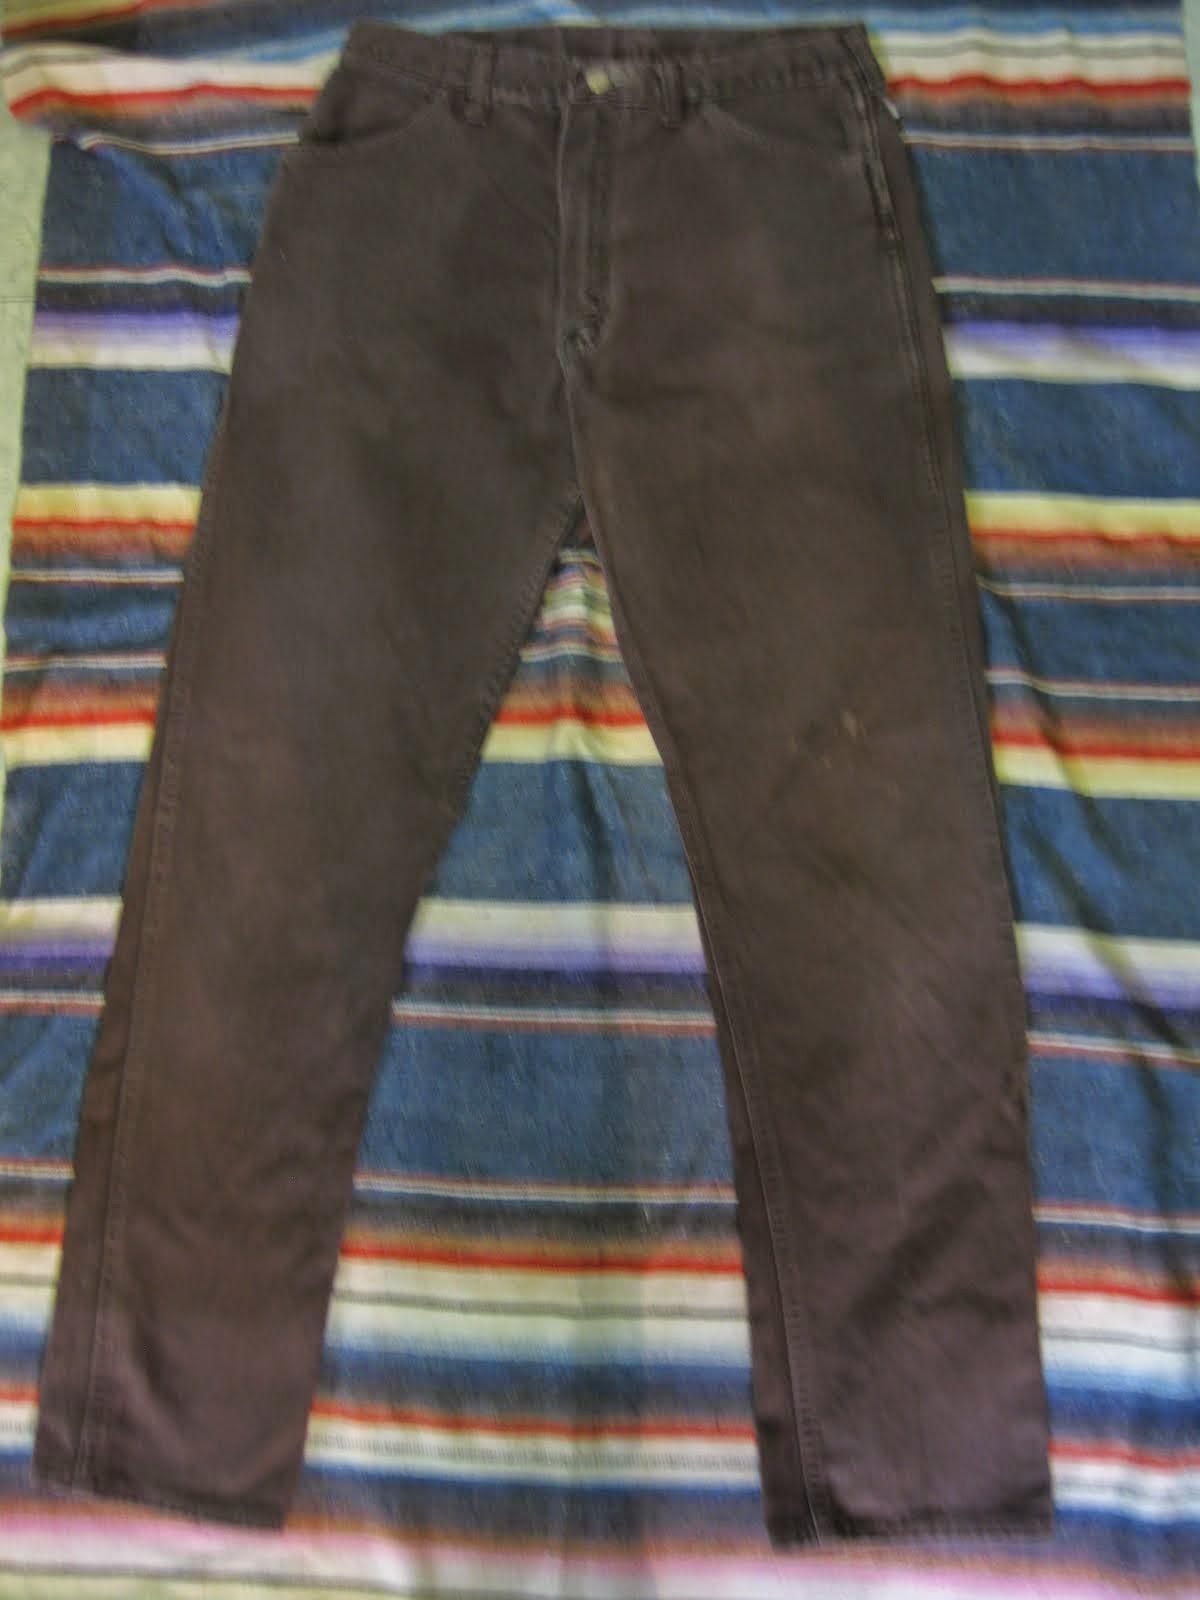 60's WRANGLER 14MWZ              SLIM FIT PANTS              BROWN カツラギ               SIZE:33×32